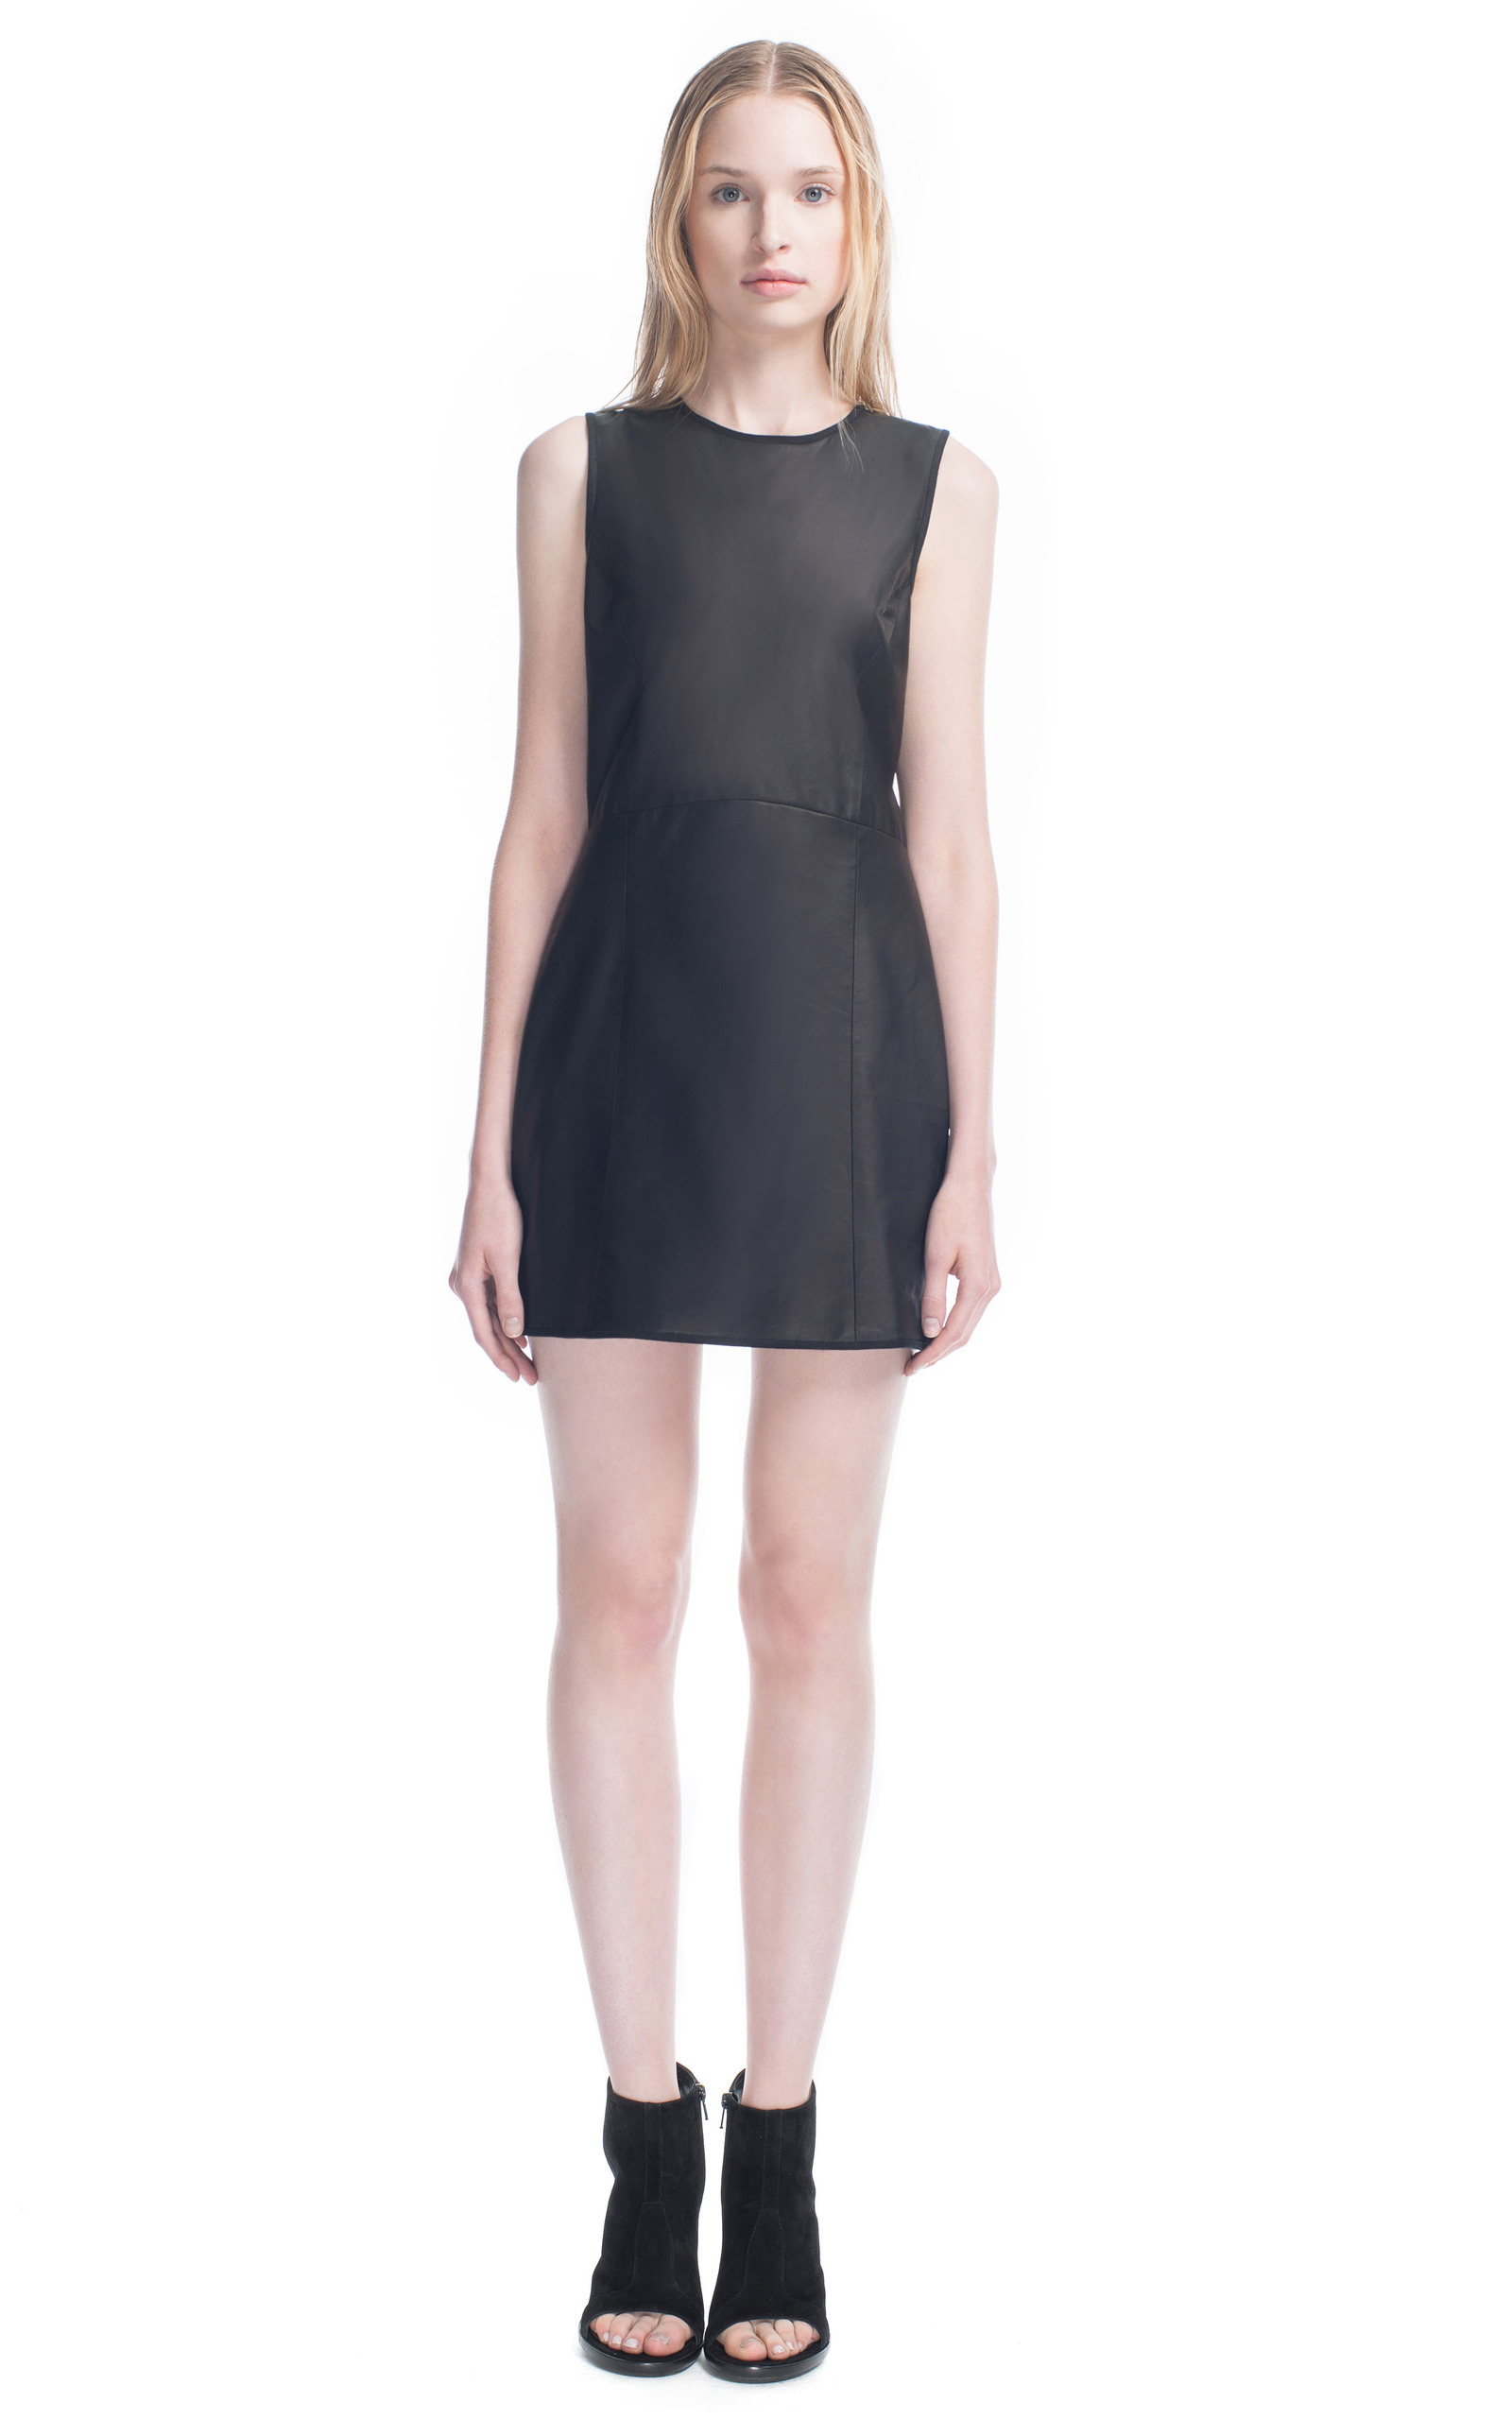 a12f10befa Dimo Dress by Theyskens' Theory   Moda Operandi